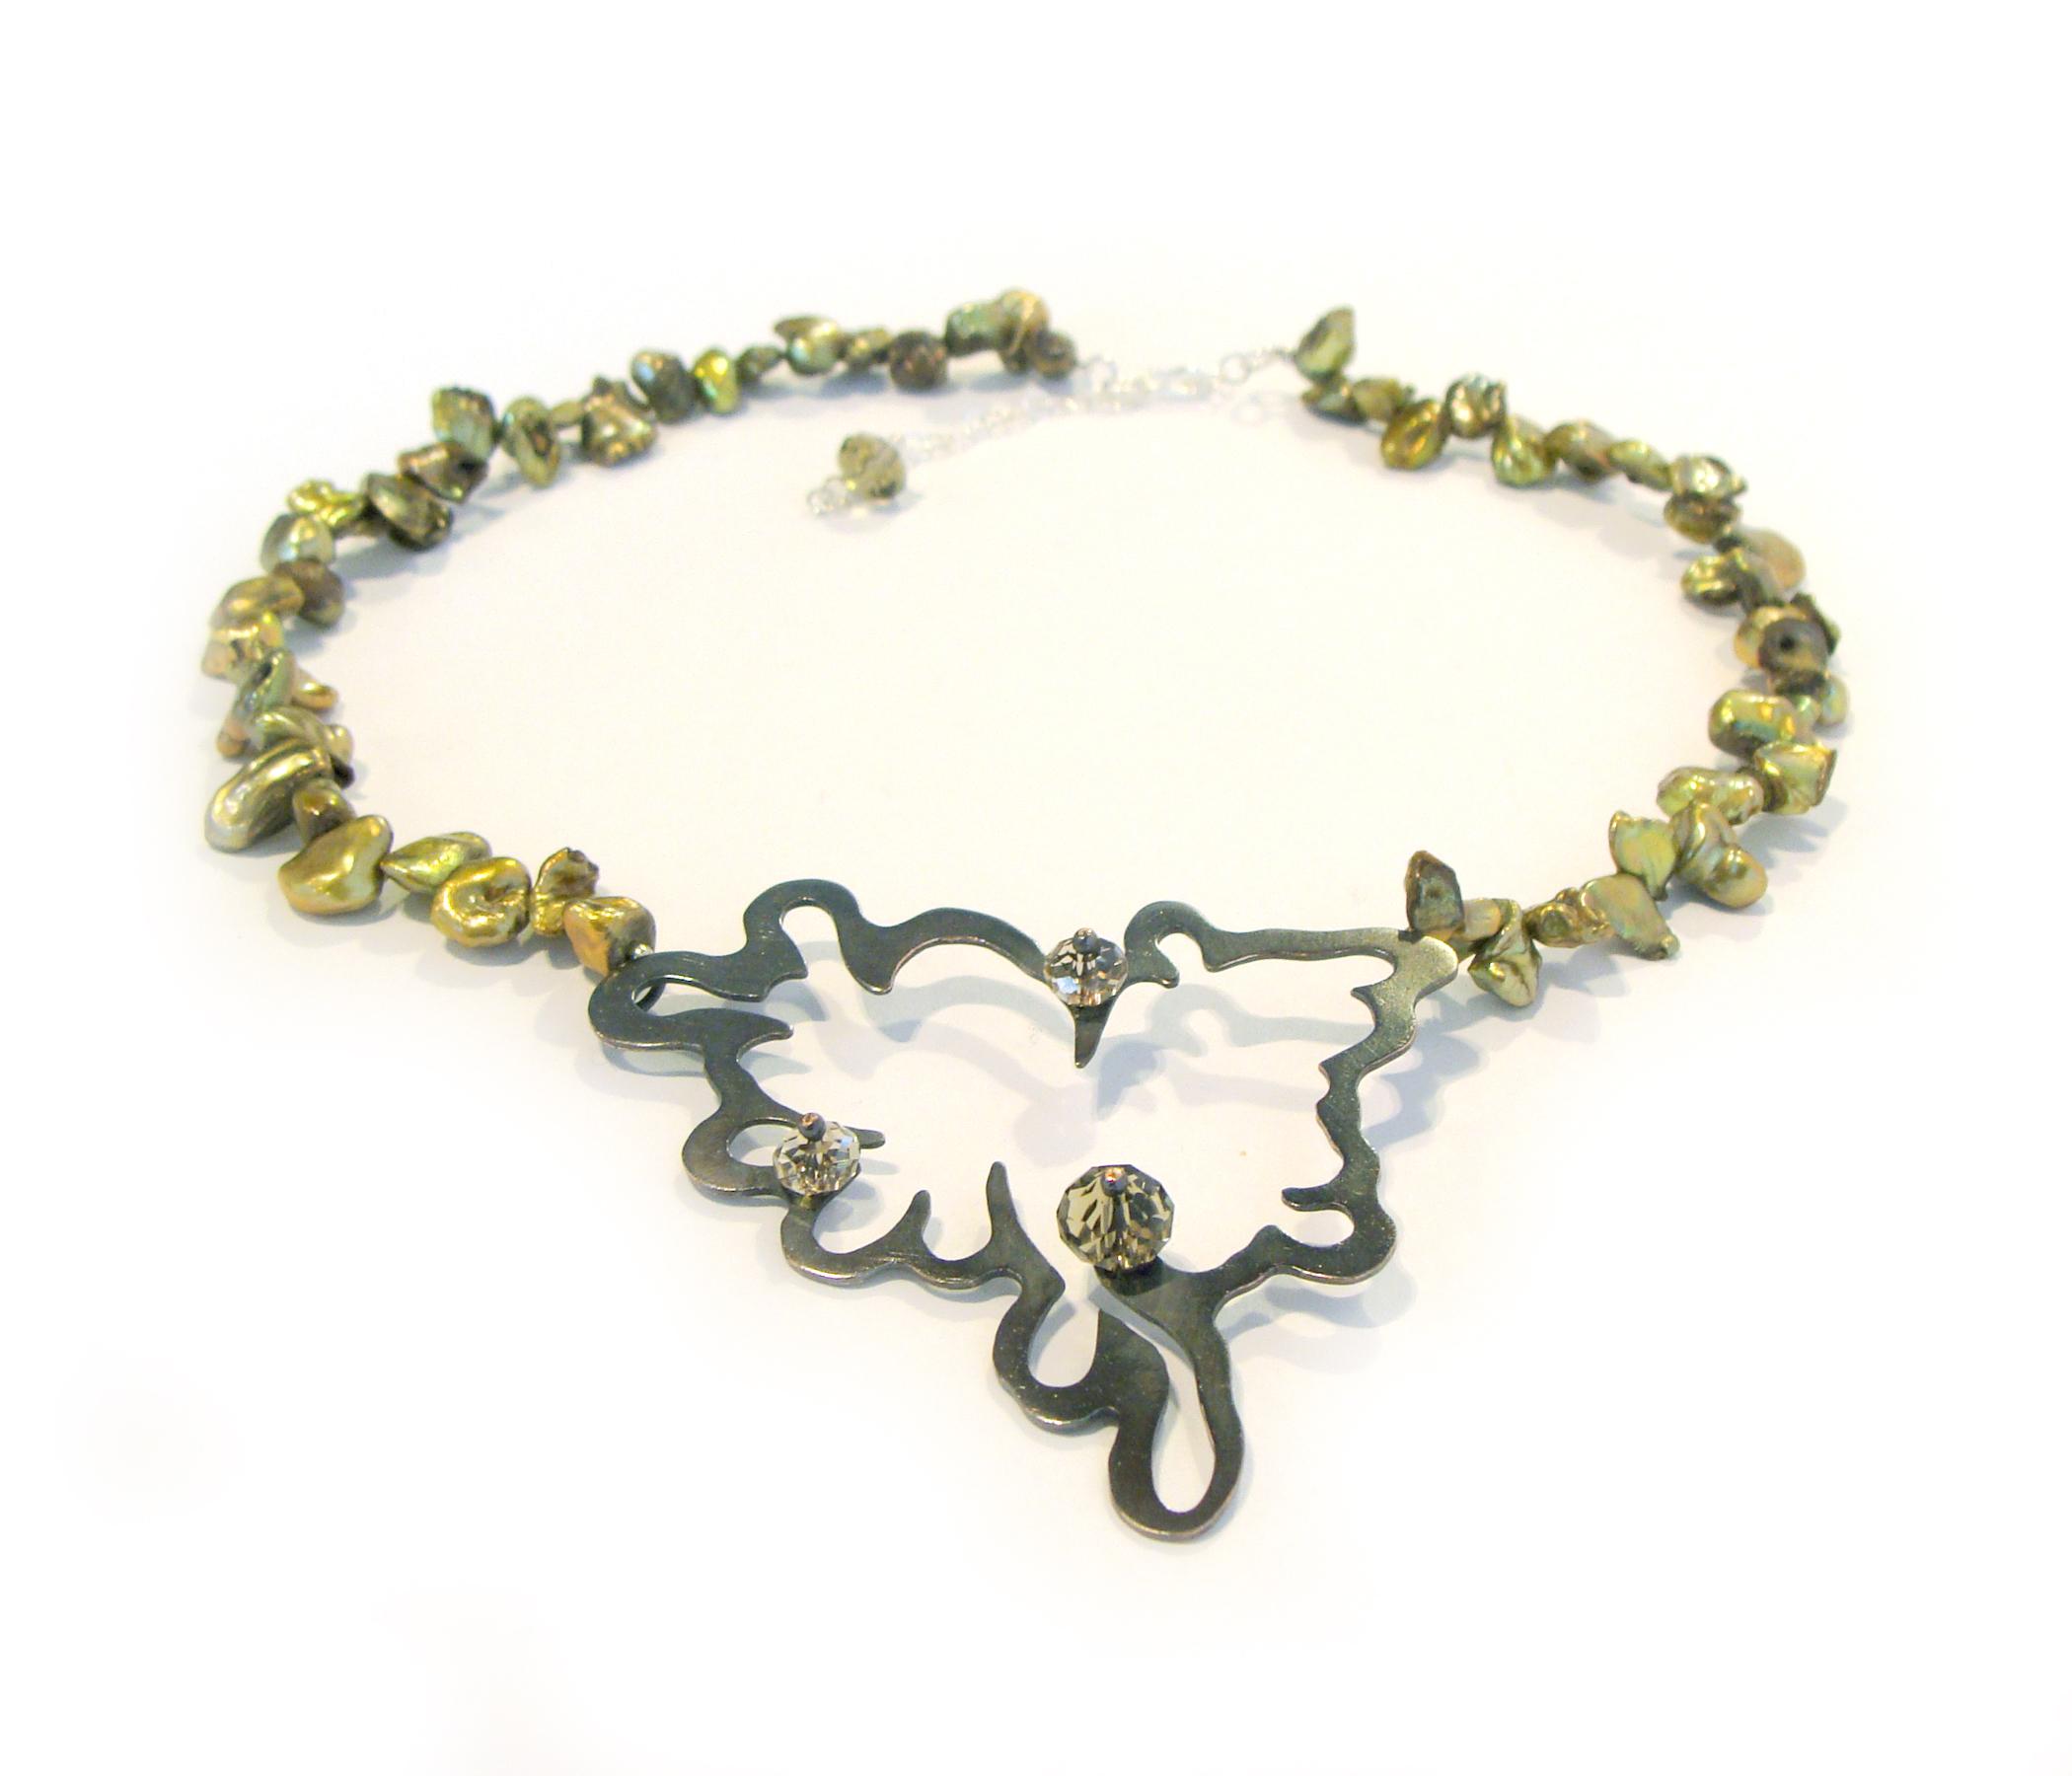 Necklace_1b.jpg